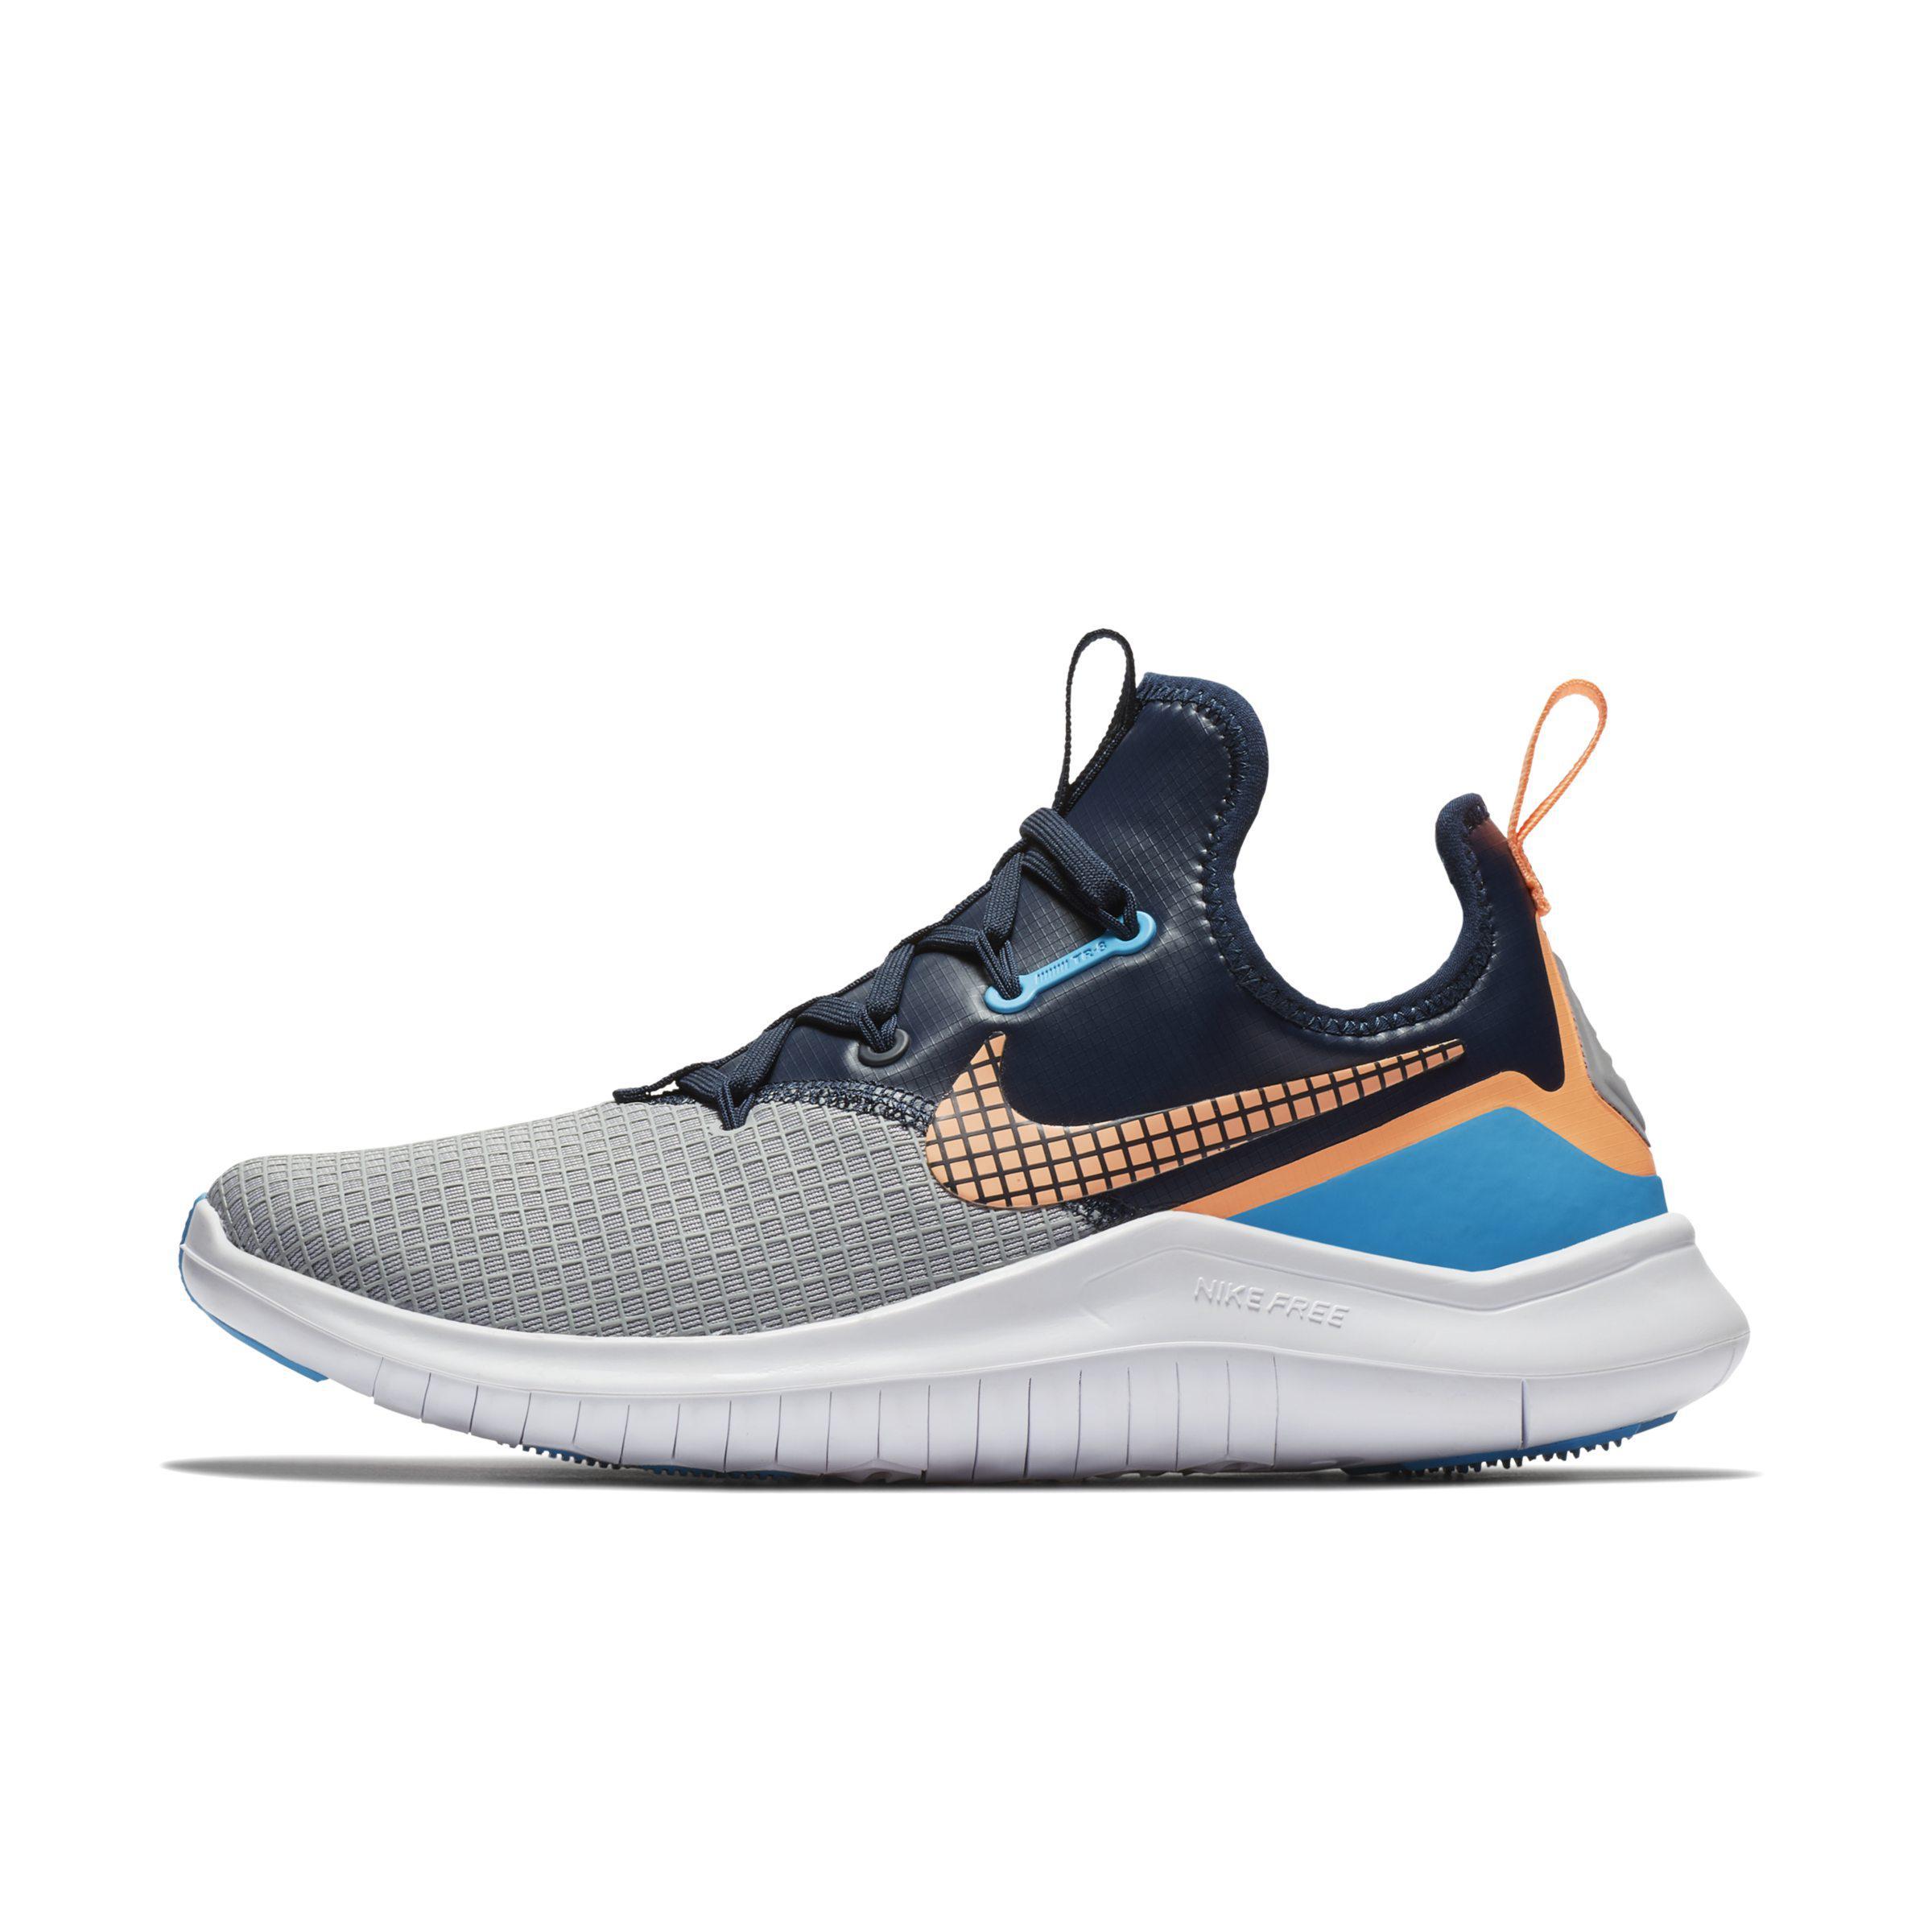 48bea07139b78 Nike Free Tr 8 Neo Gym hiit Cross Training Shoe in Gray - Lyst